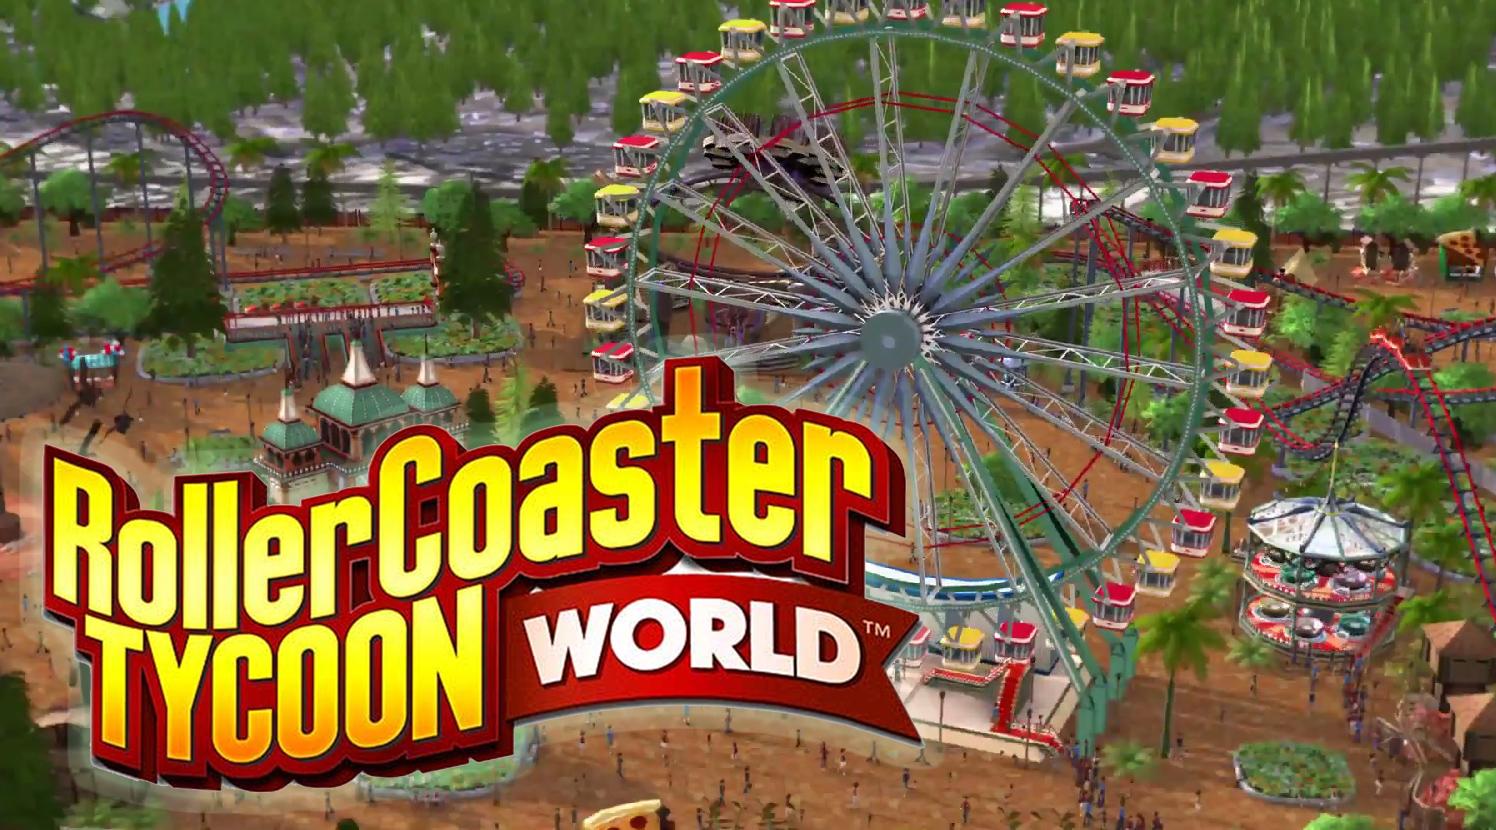 Atari released Roller coaster Tycoon world Today